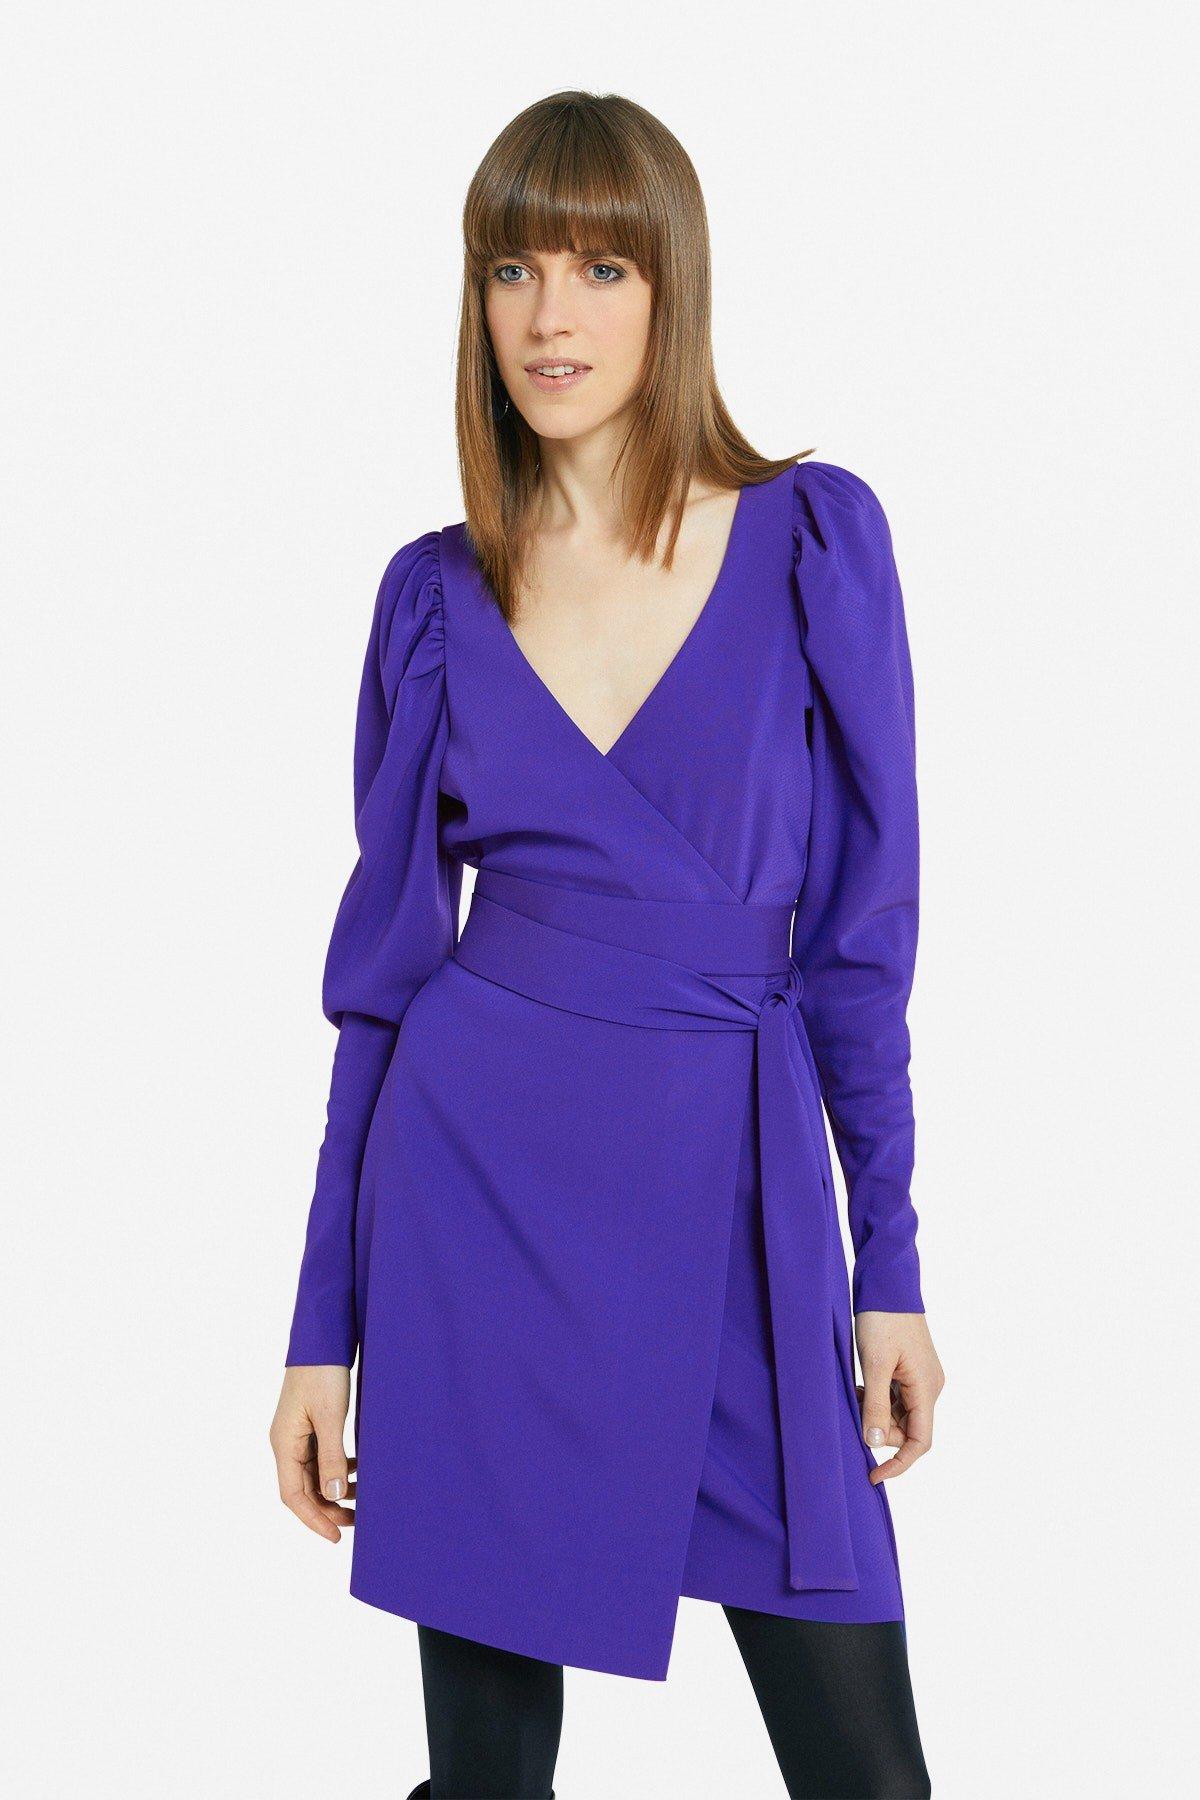 Criss-cross mini dress with sash